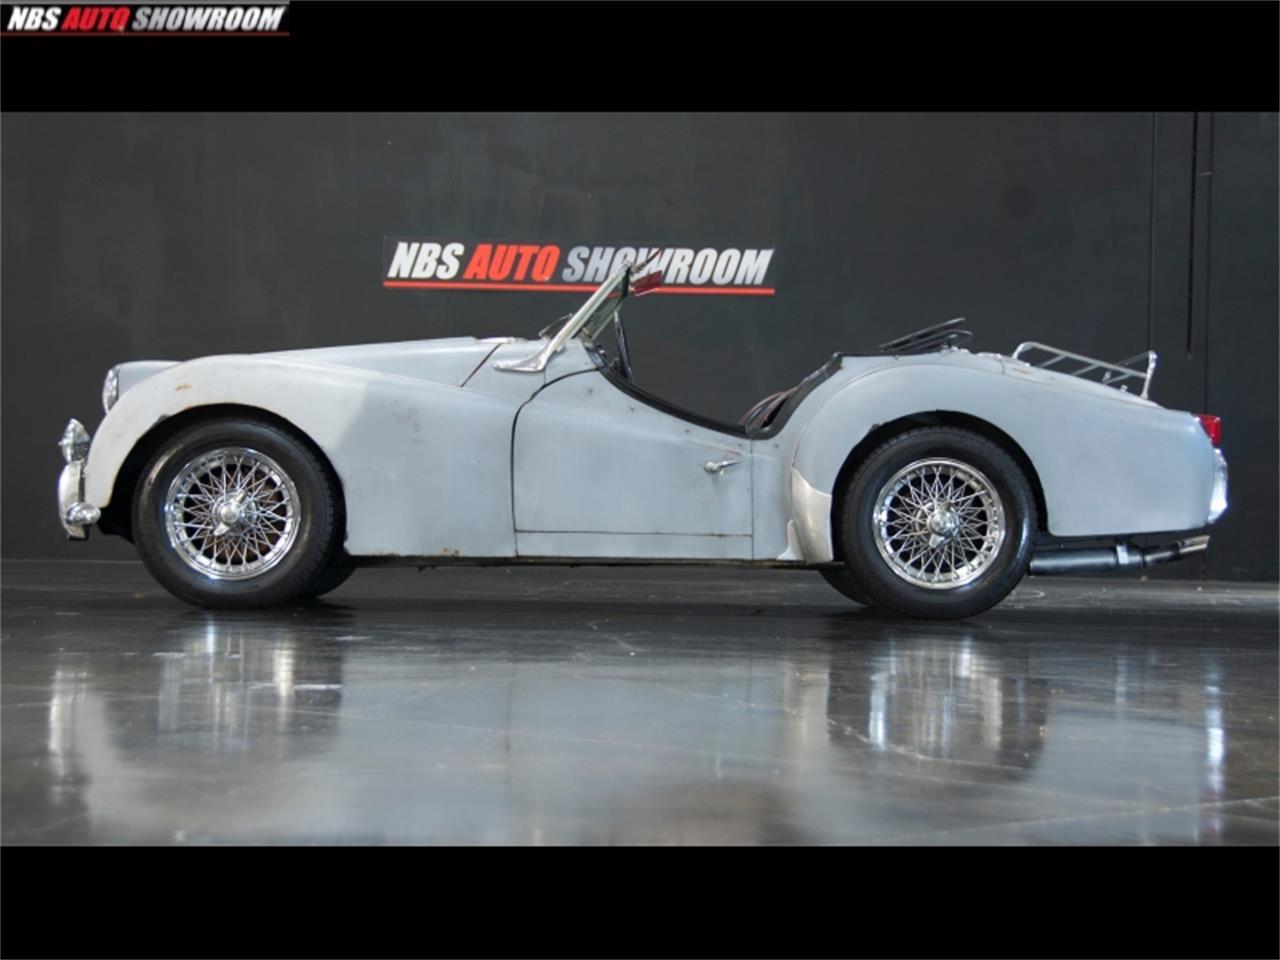 1959 Triumph TR3A (CC-1200052) for sale in Milpitas, California